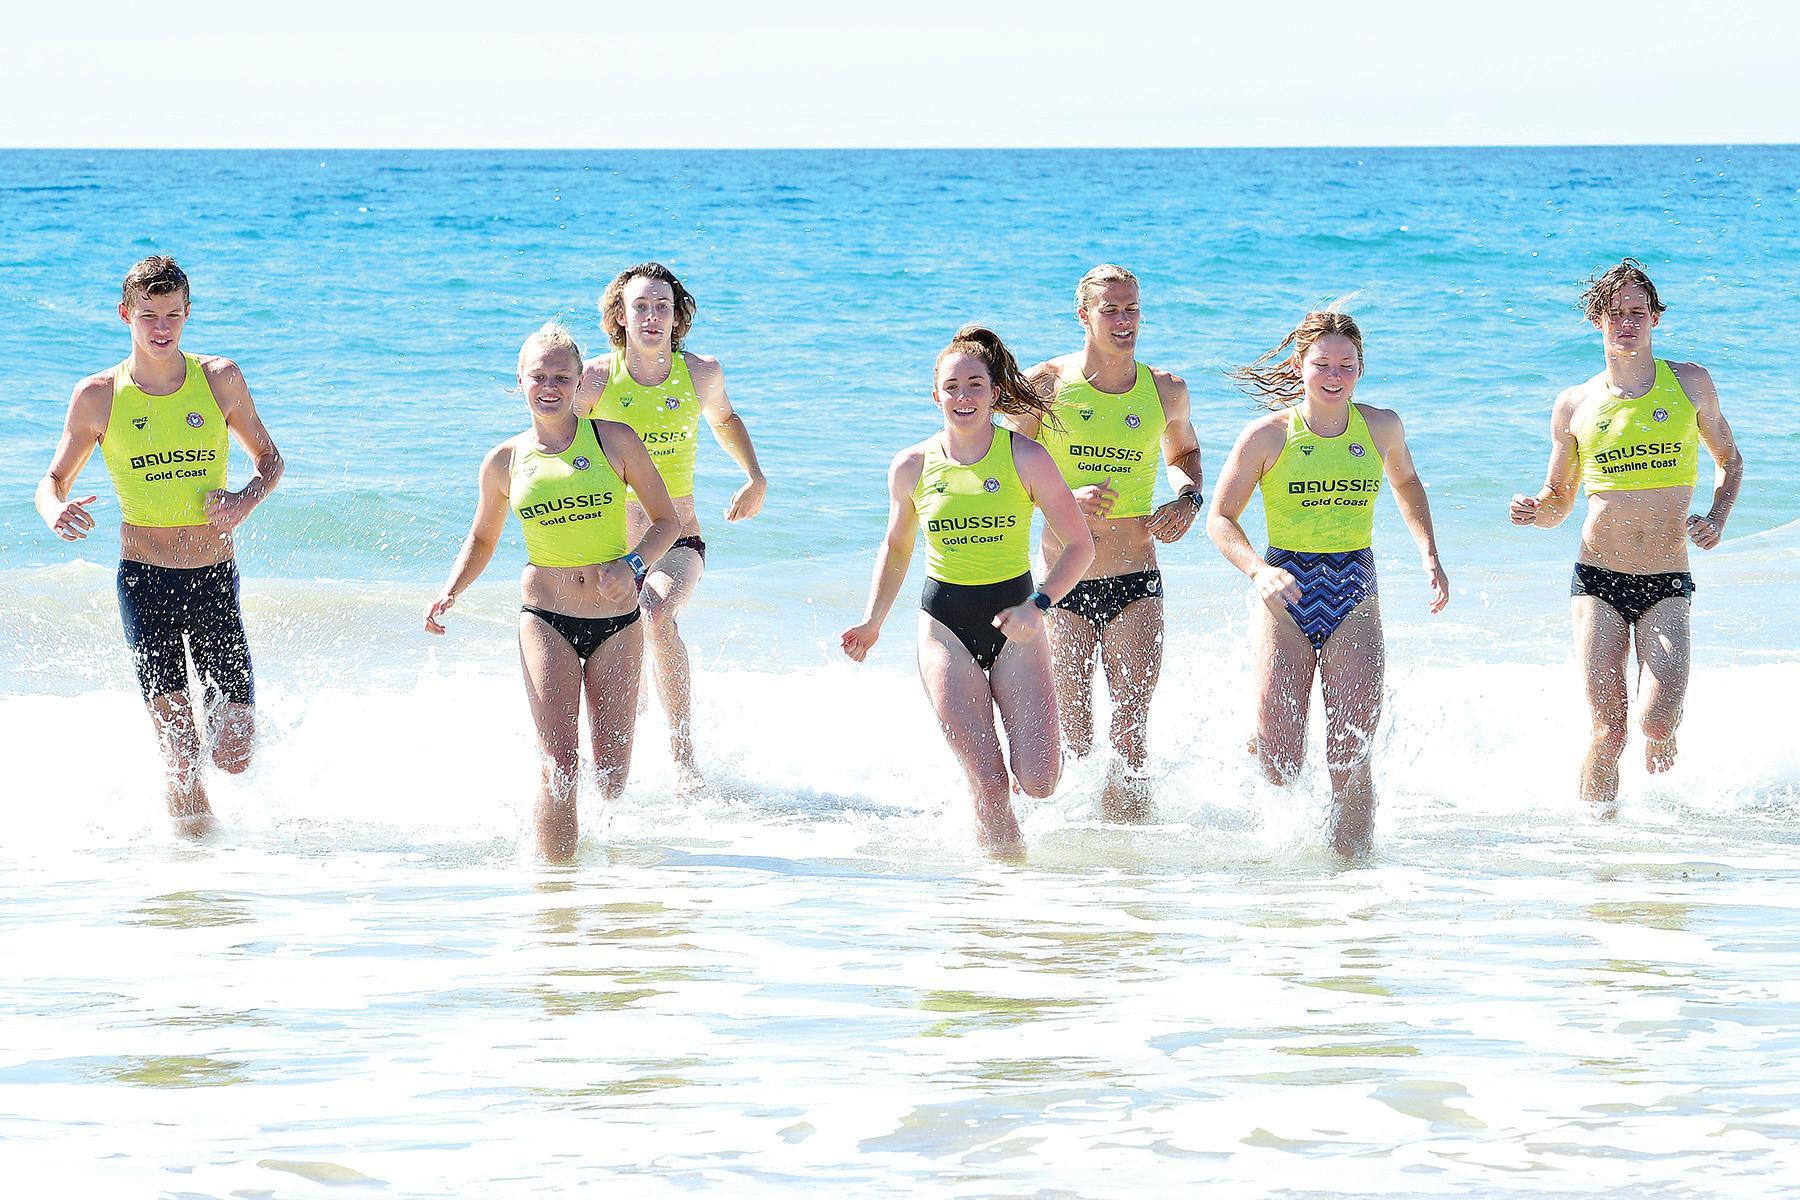 TALENT: The next generation of Sunshine Coast surf lifesavers at Alexandra Headland Beach. Ruben Zakarsay, Emma Woods, Lucinda Kelly, Corey Linton, Jett Kenny, Phoebe Wills-Grace and Campbell Guthrie.